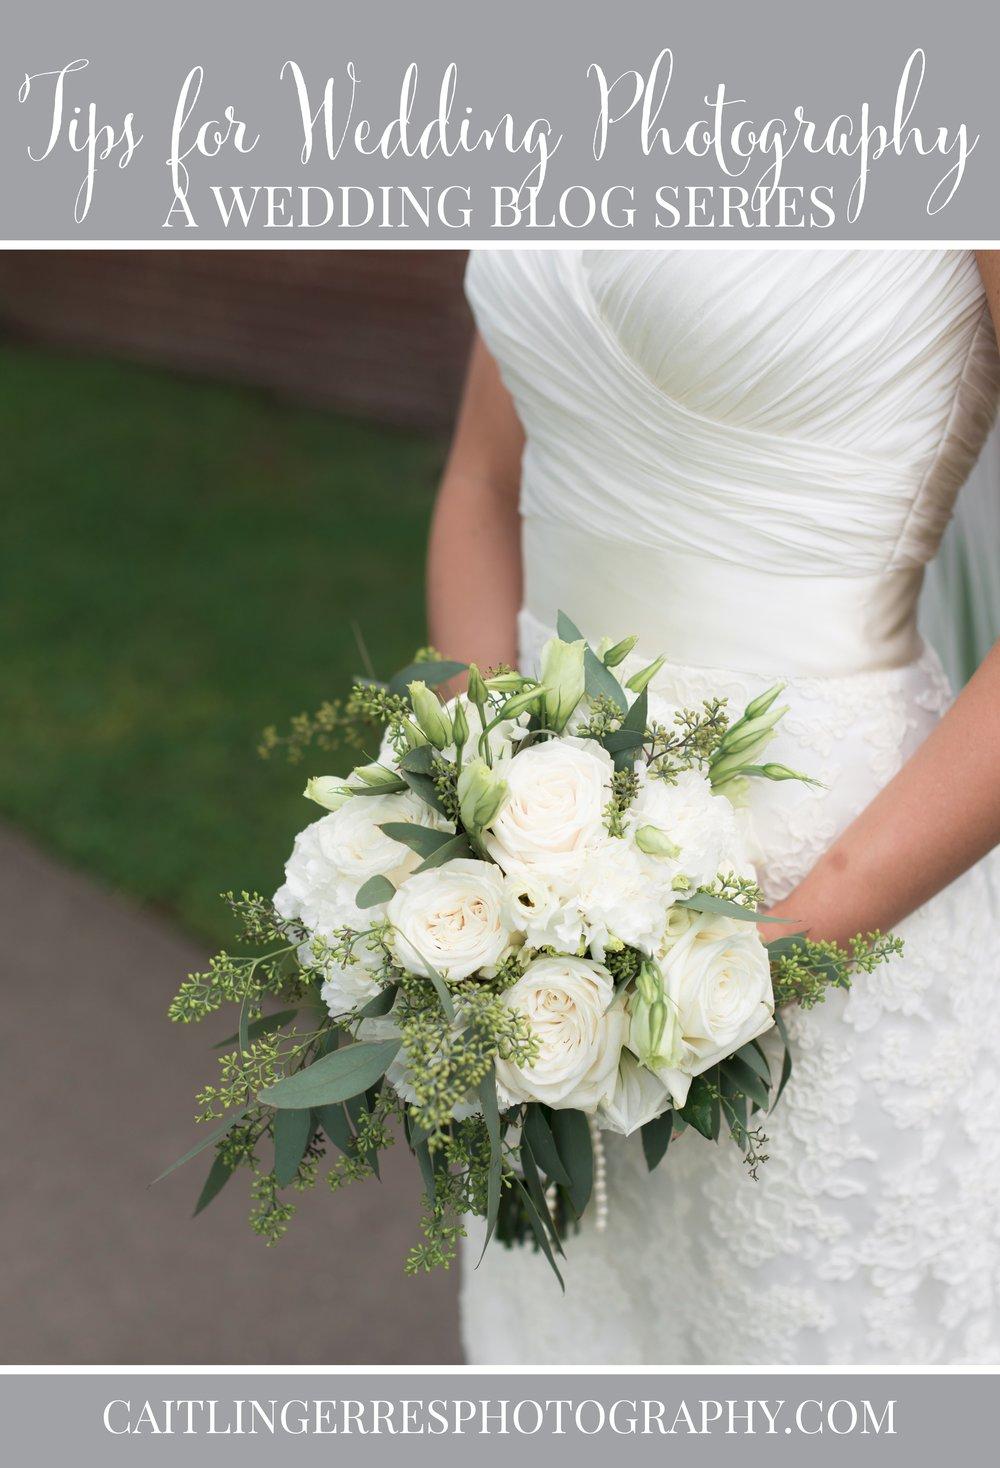 Wedding Photography Blog Series 1.jpg